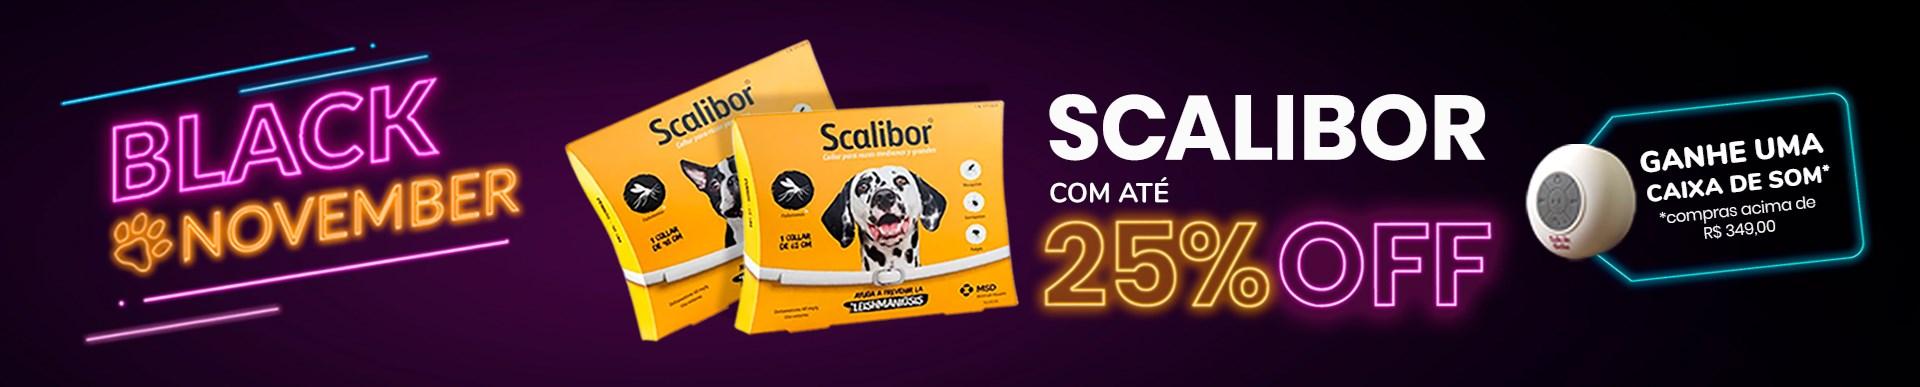 Black November - Banner de Categoria - Scalibor